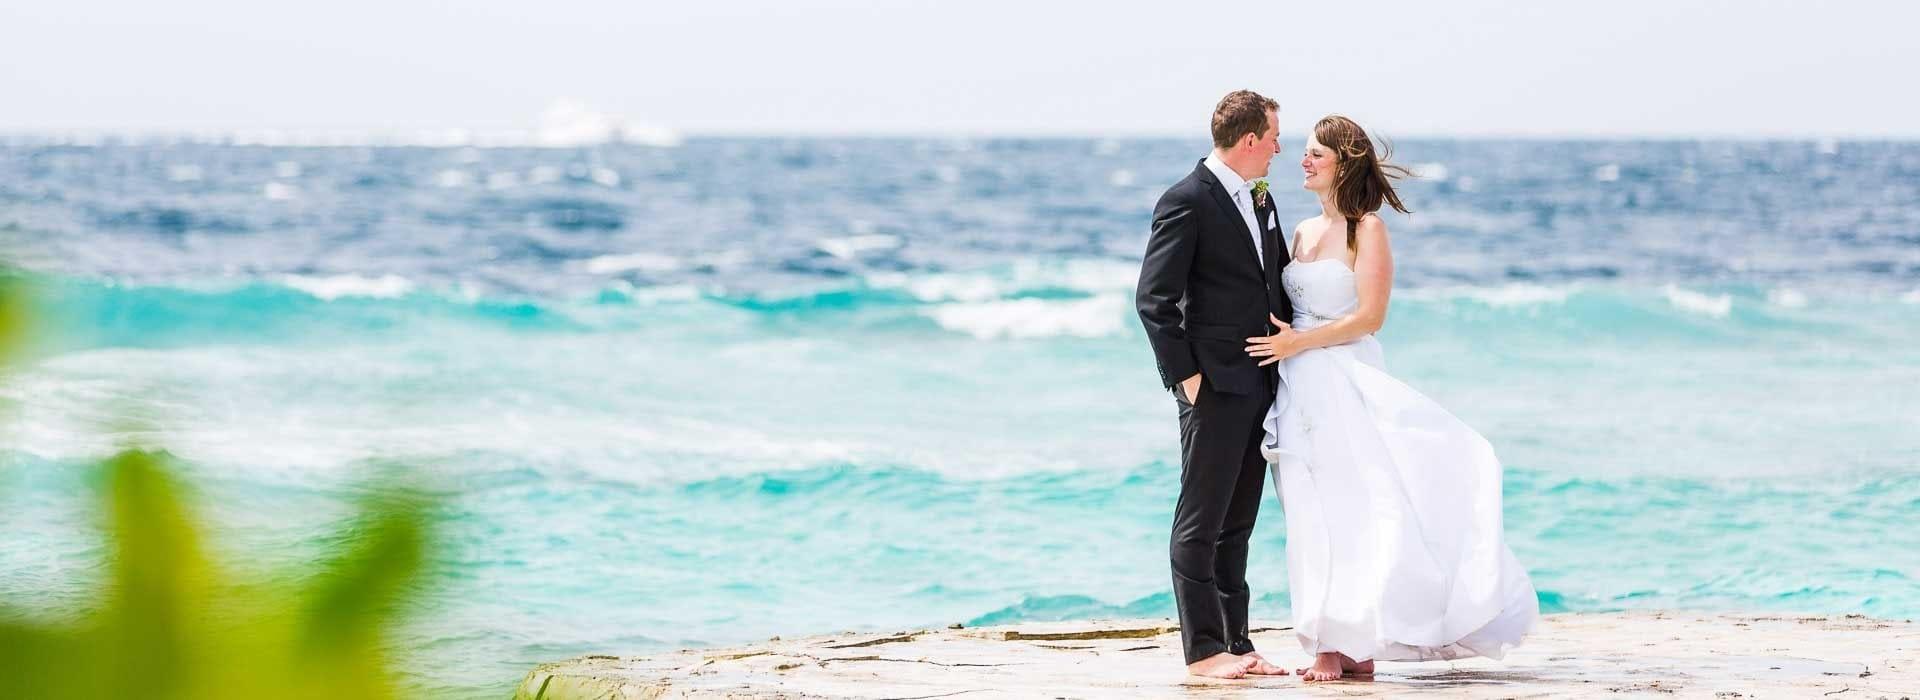 Emotionale Hochzeitsfotografie Malediven Bandos